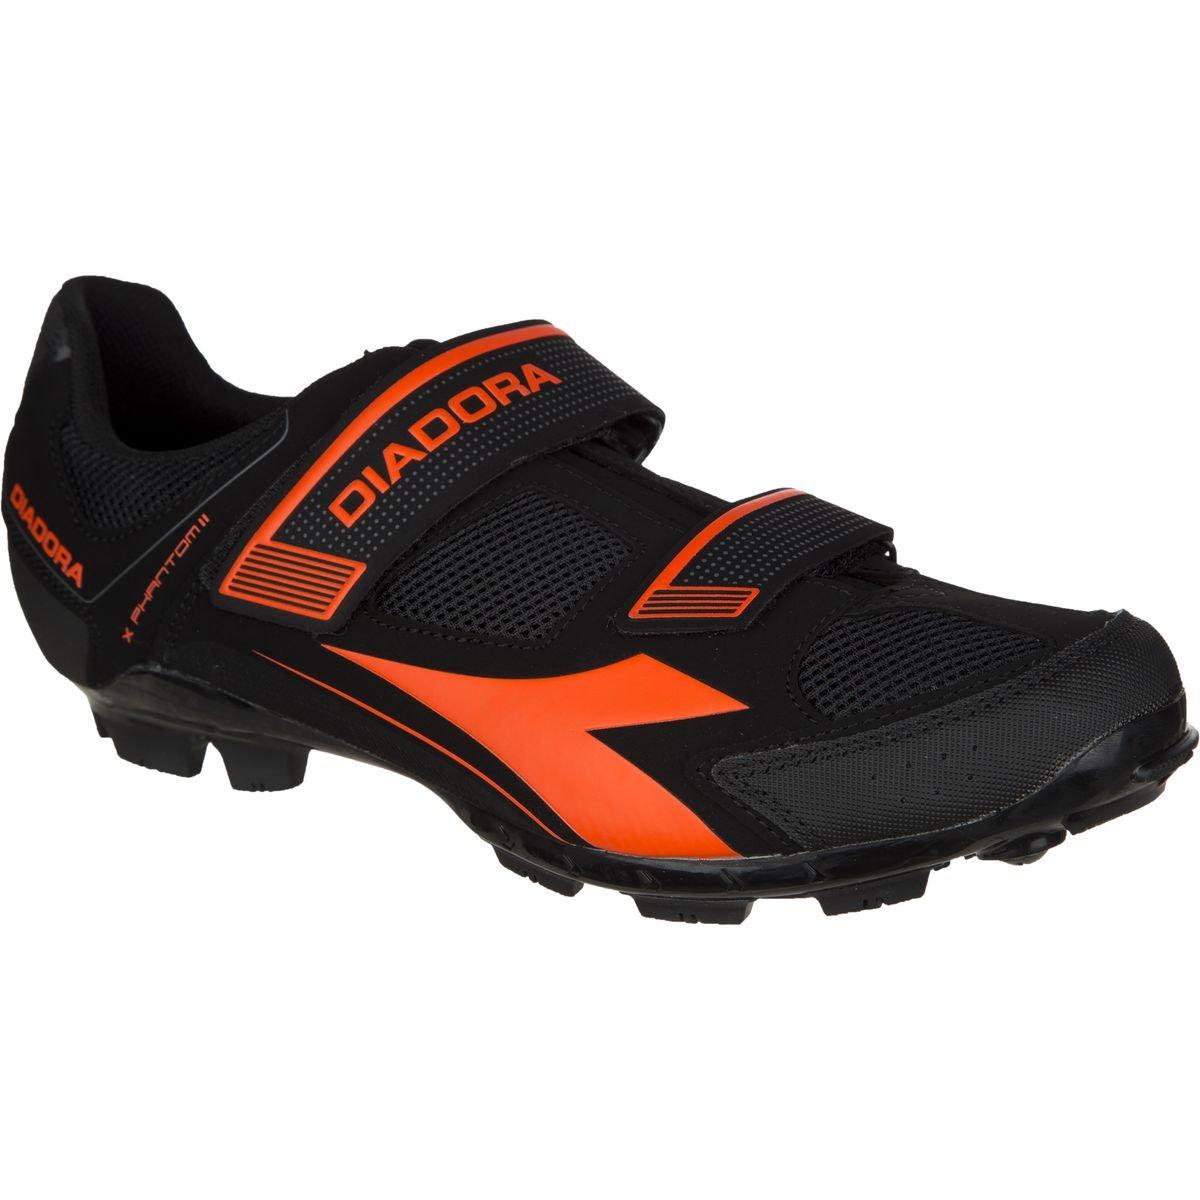 Diadora x-phantom II Shoes – Men 's 38 Black/Red Fluo B01EBUSJHK